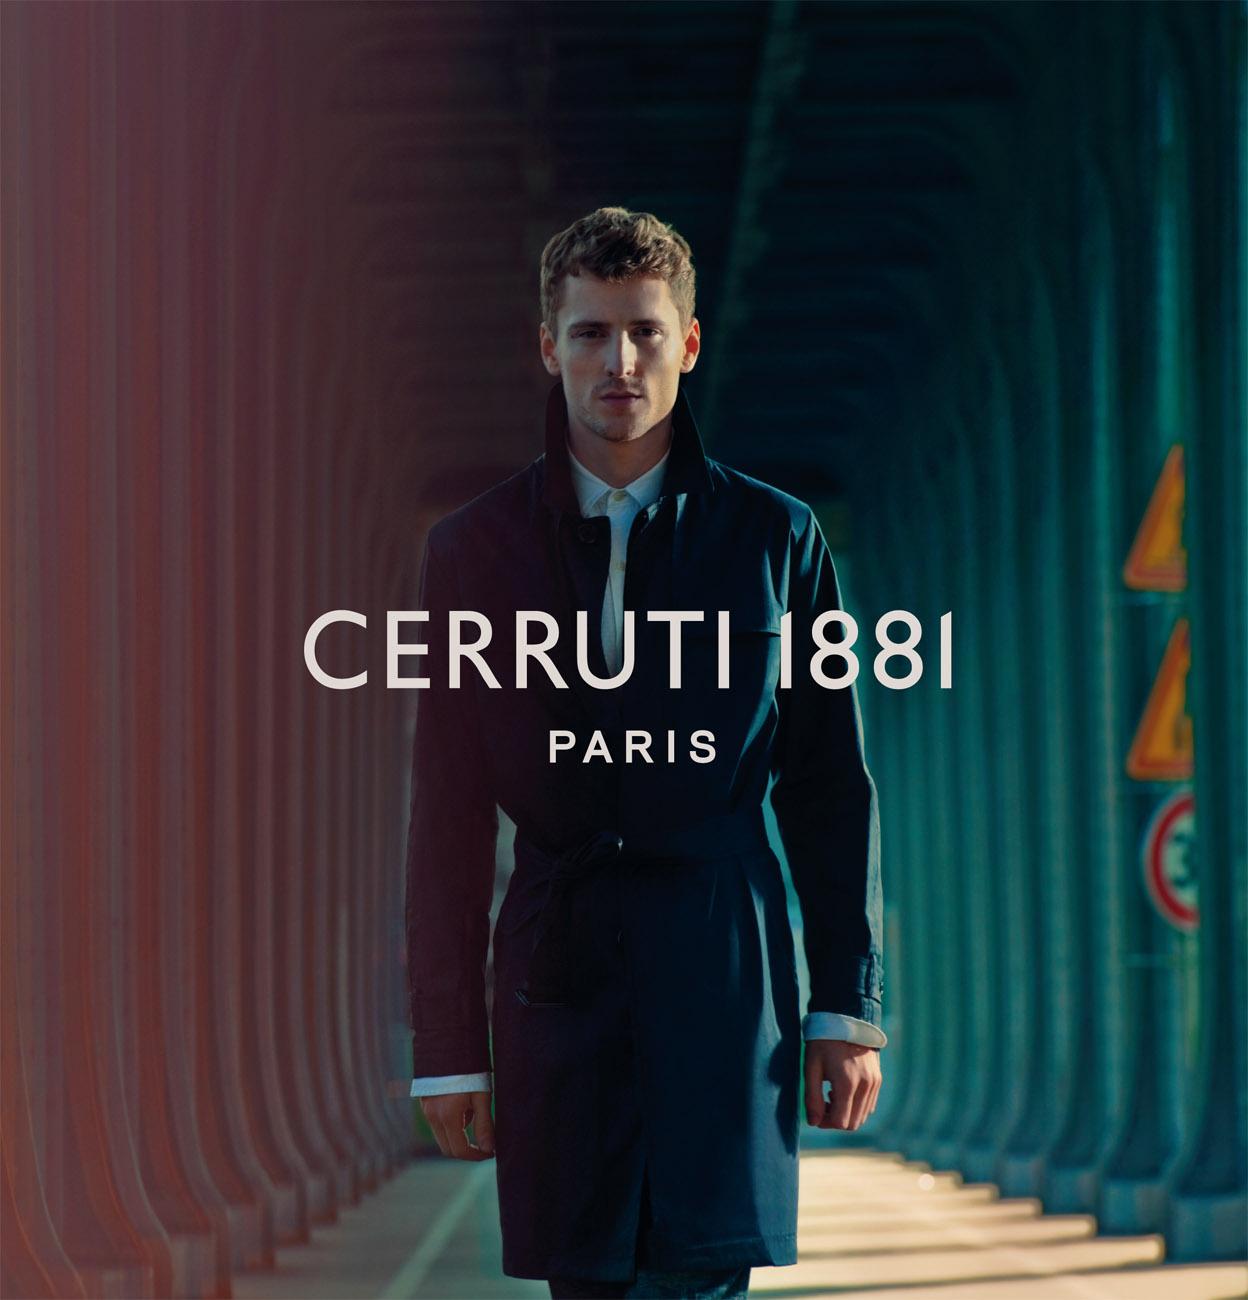 George Barnett Stars in Cerruti 1881 Paris' Spring/Summer 2013 Campaign